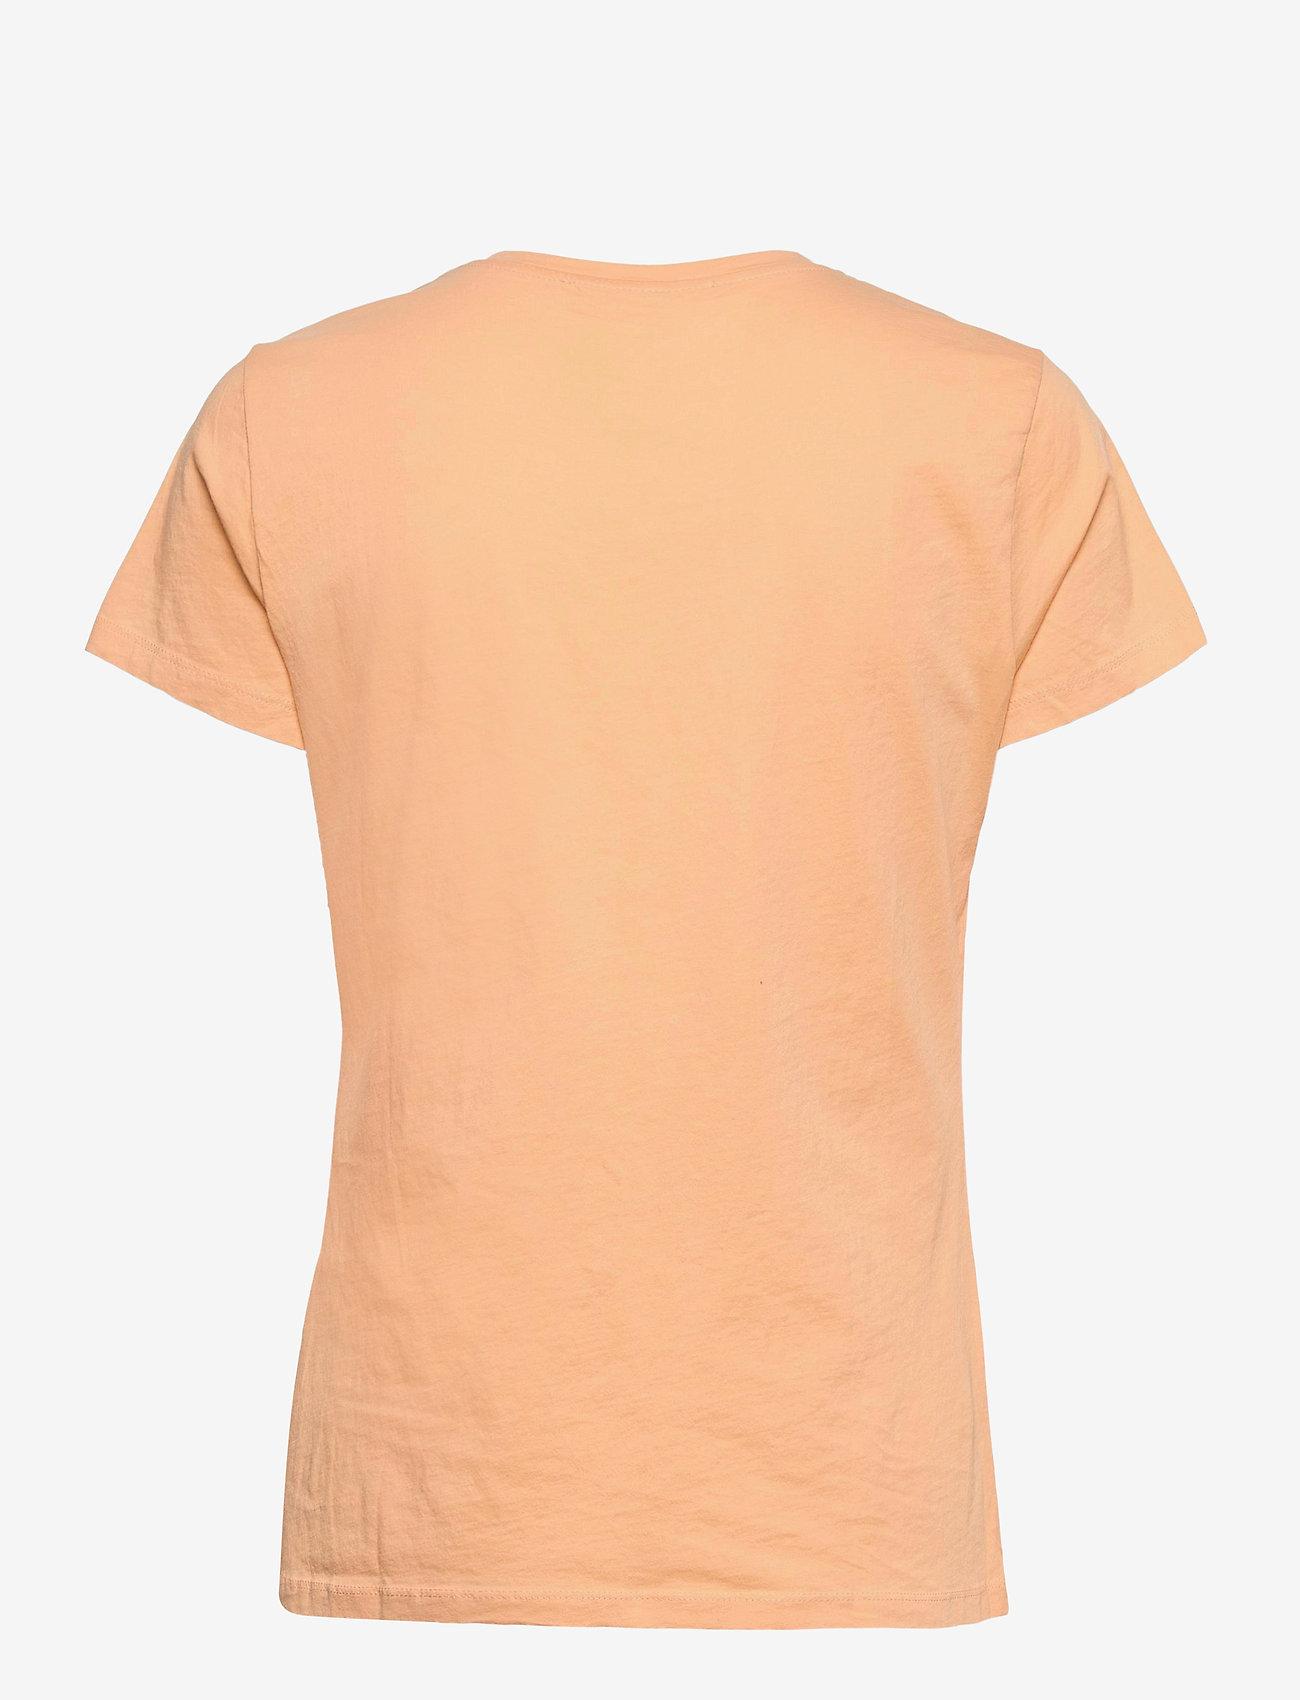 Samsøe Samsøe - Solly tee solid 205 - t-shirts - peach nougat - 1